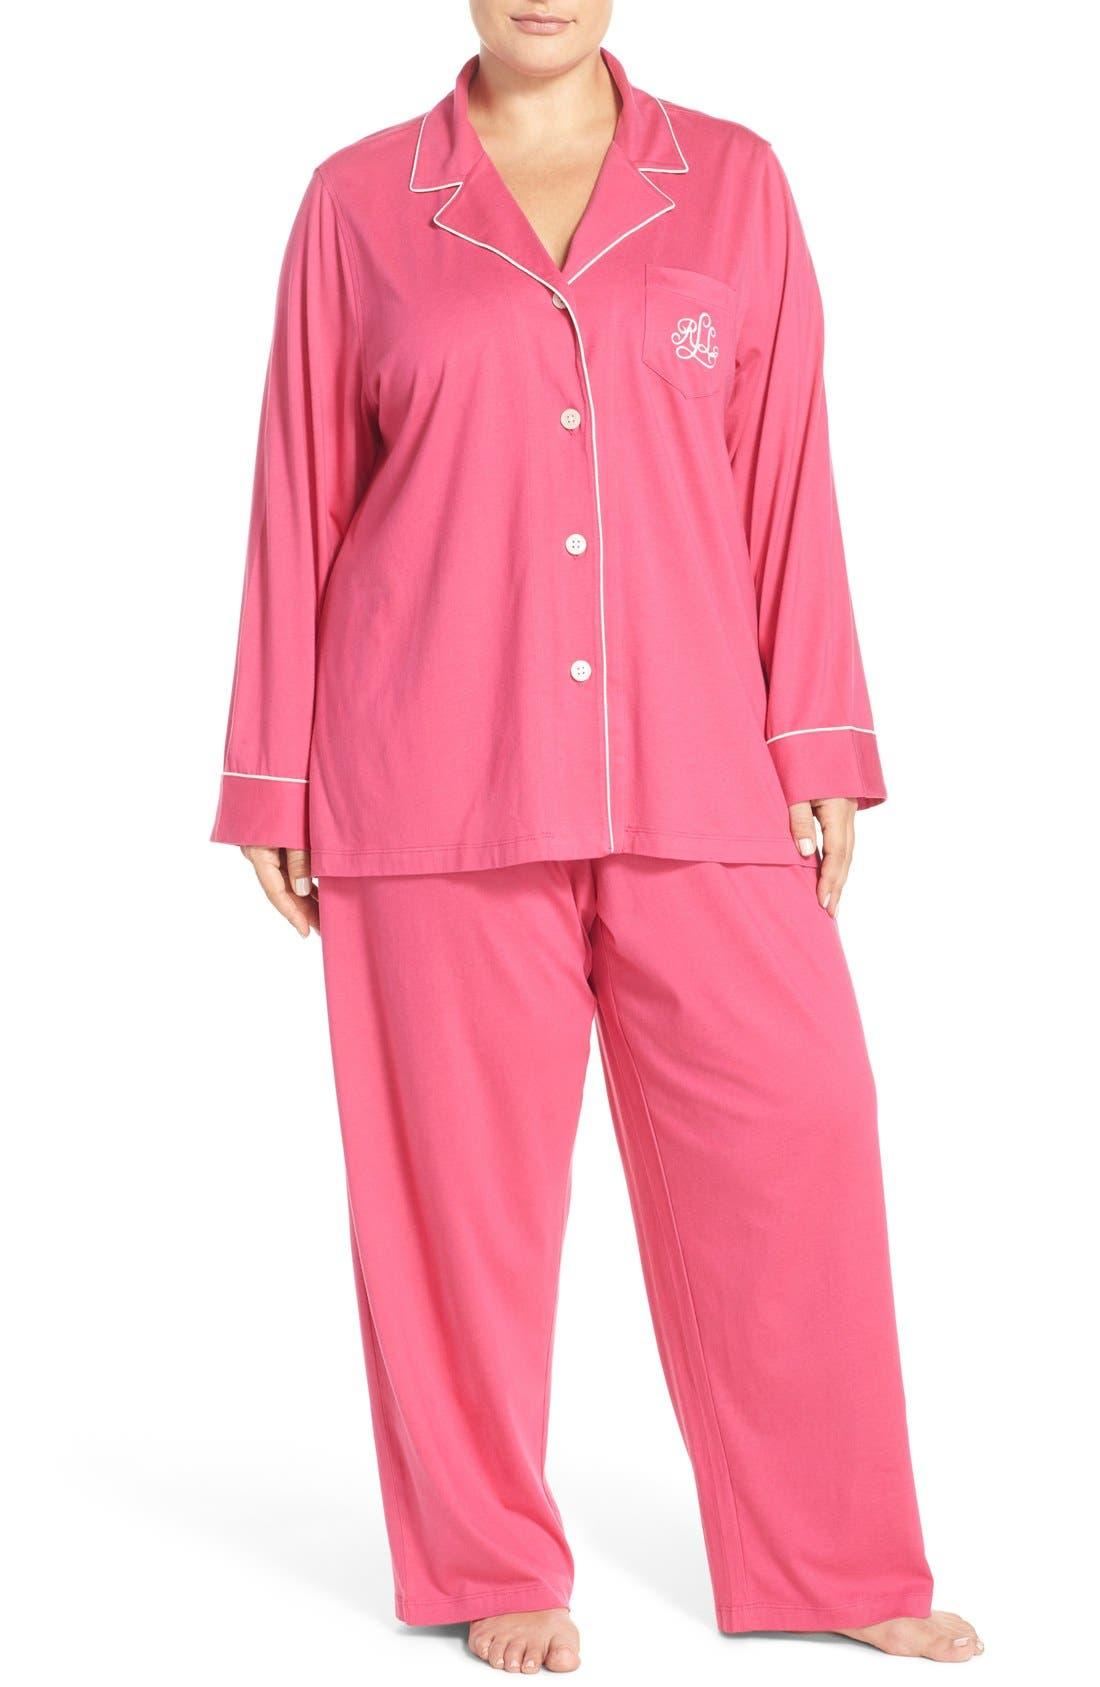 Alternate Image 1 Selected - Lauren Ralph Lauren Knit Pajamas (Plus Size) (Online Only)